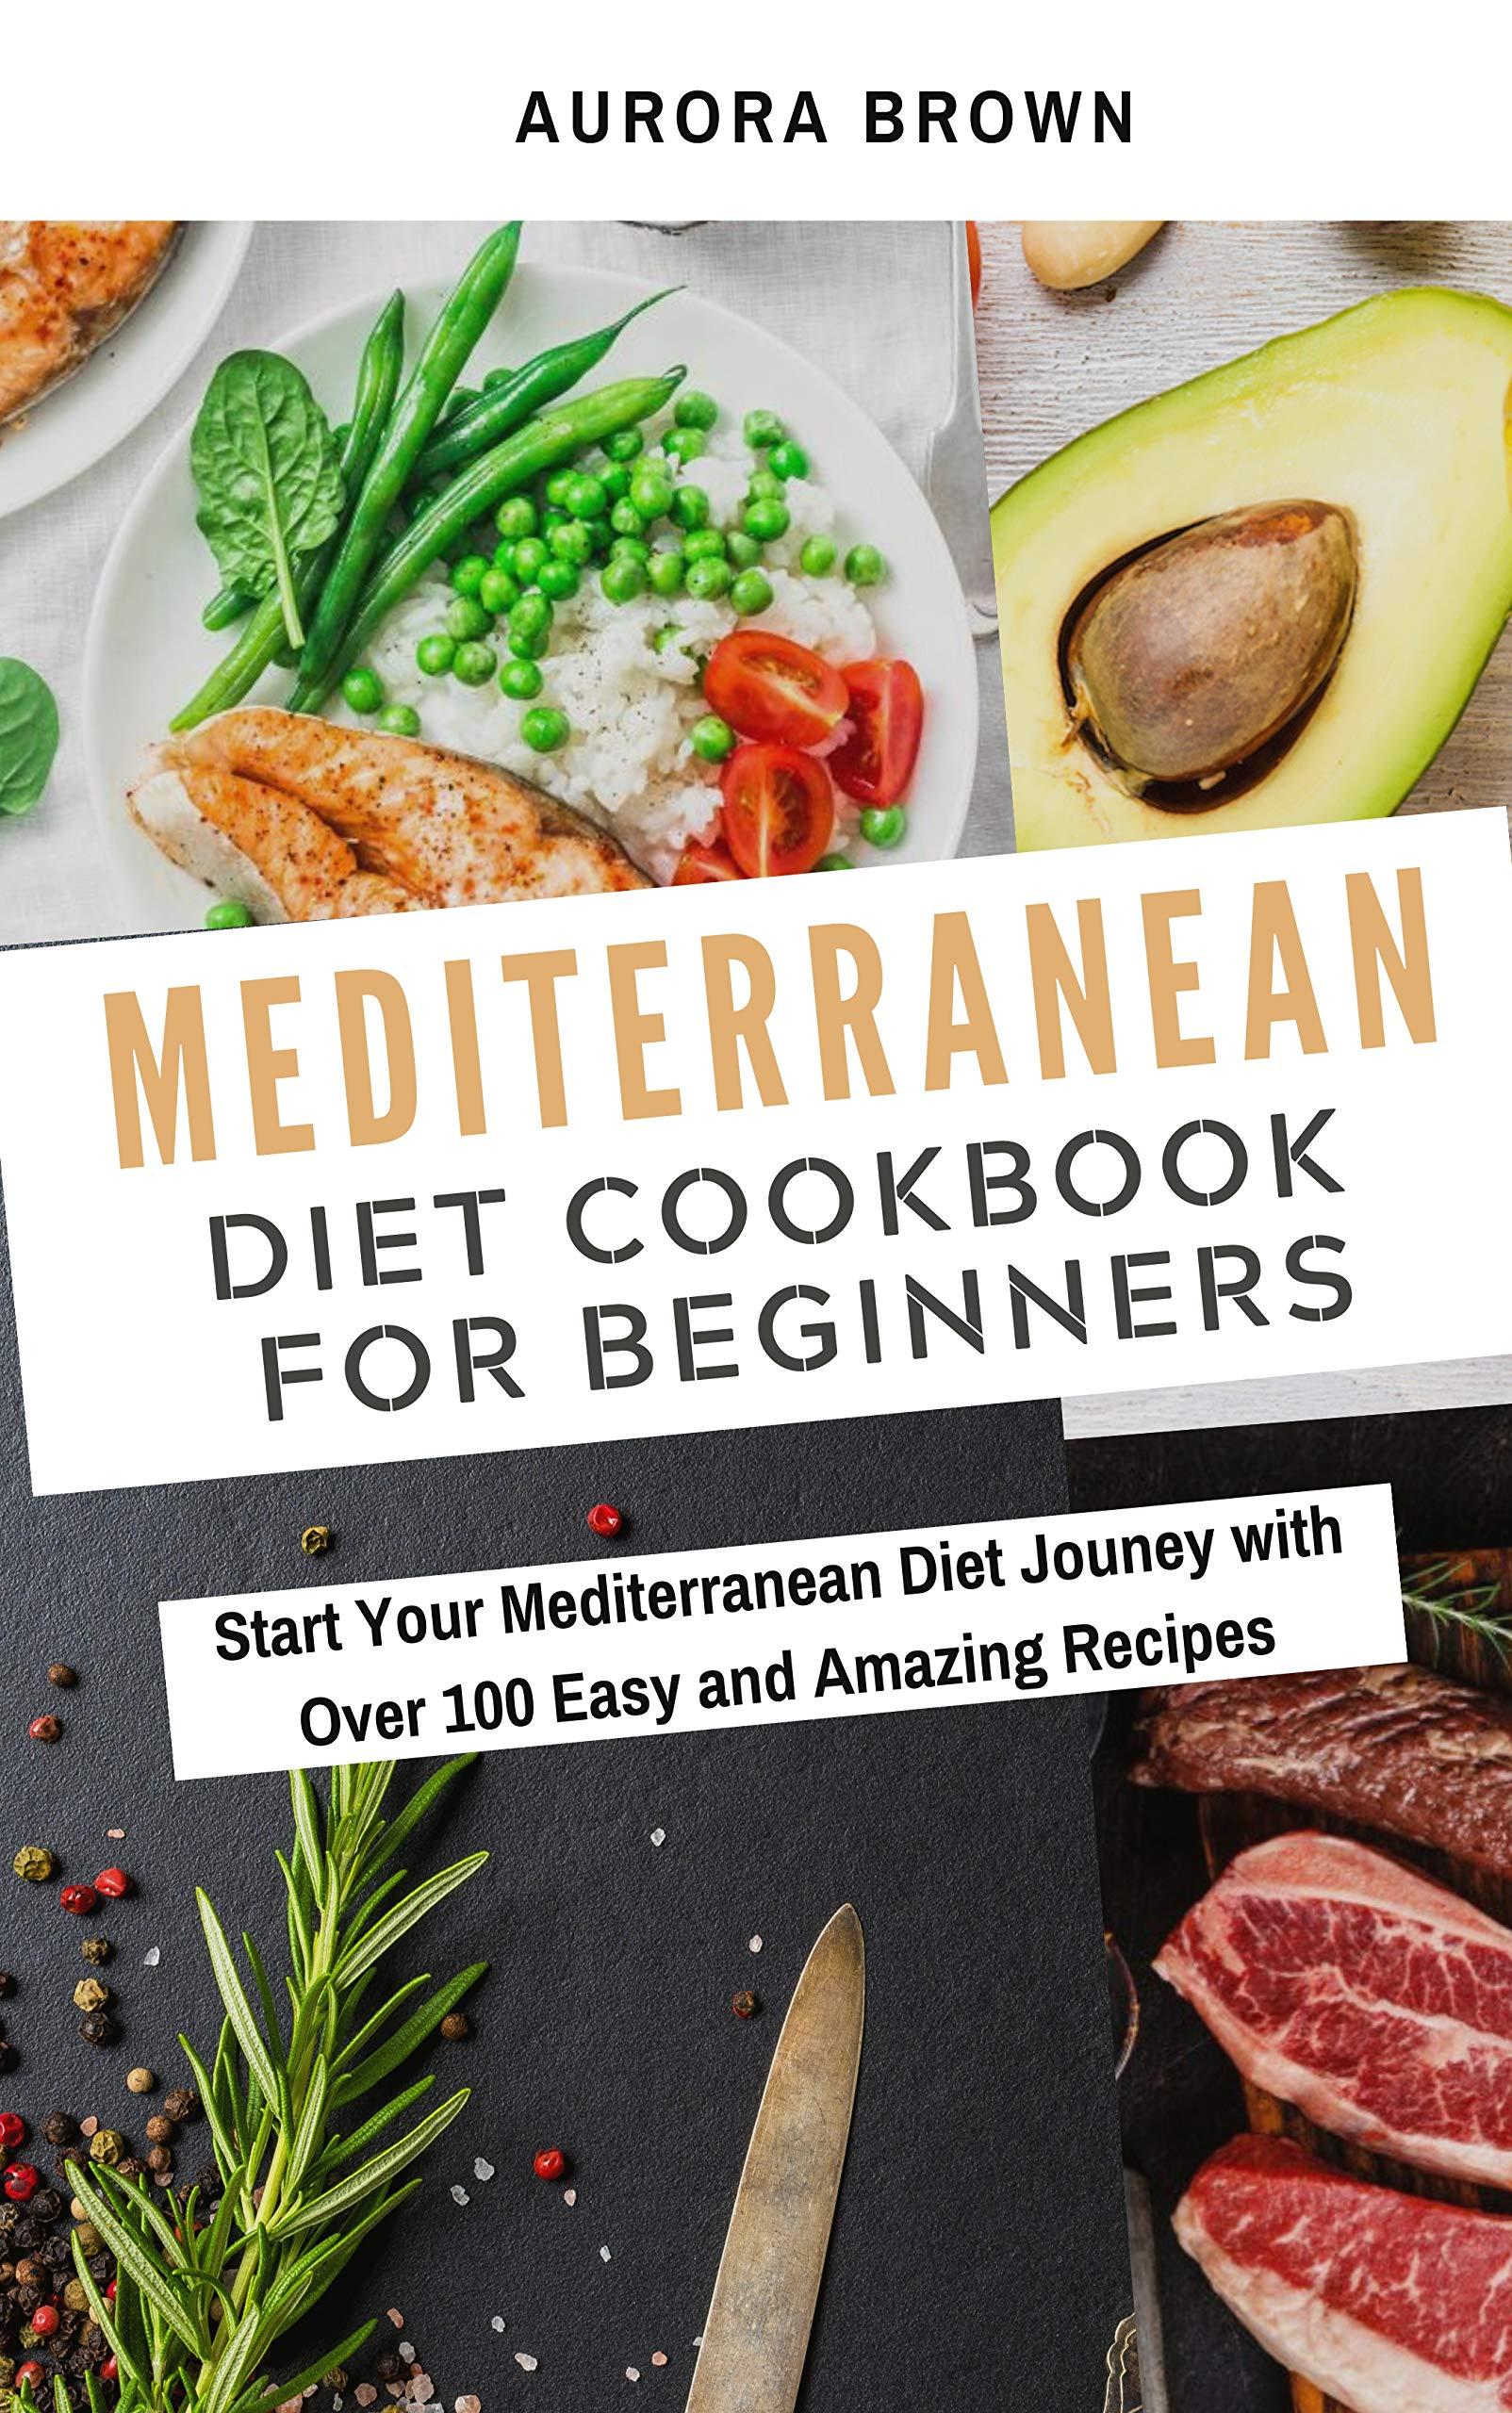 Mediterranean Diet Cookbook for Beginners: Start Your Mediterranean Diet Jouney with Over 100 Easy and Amazing Recipes